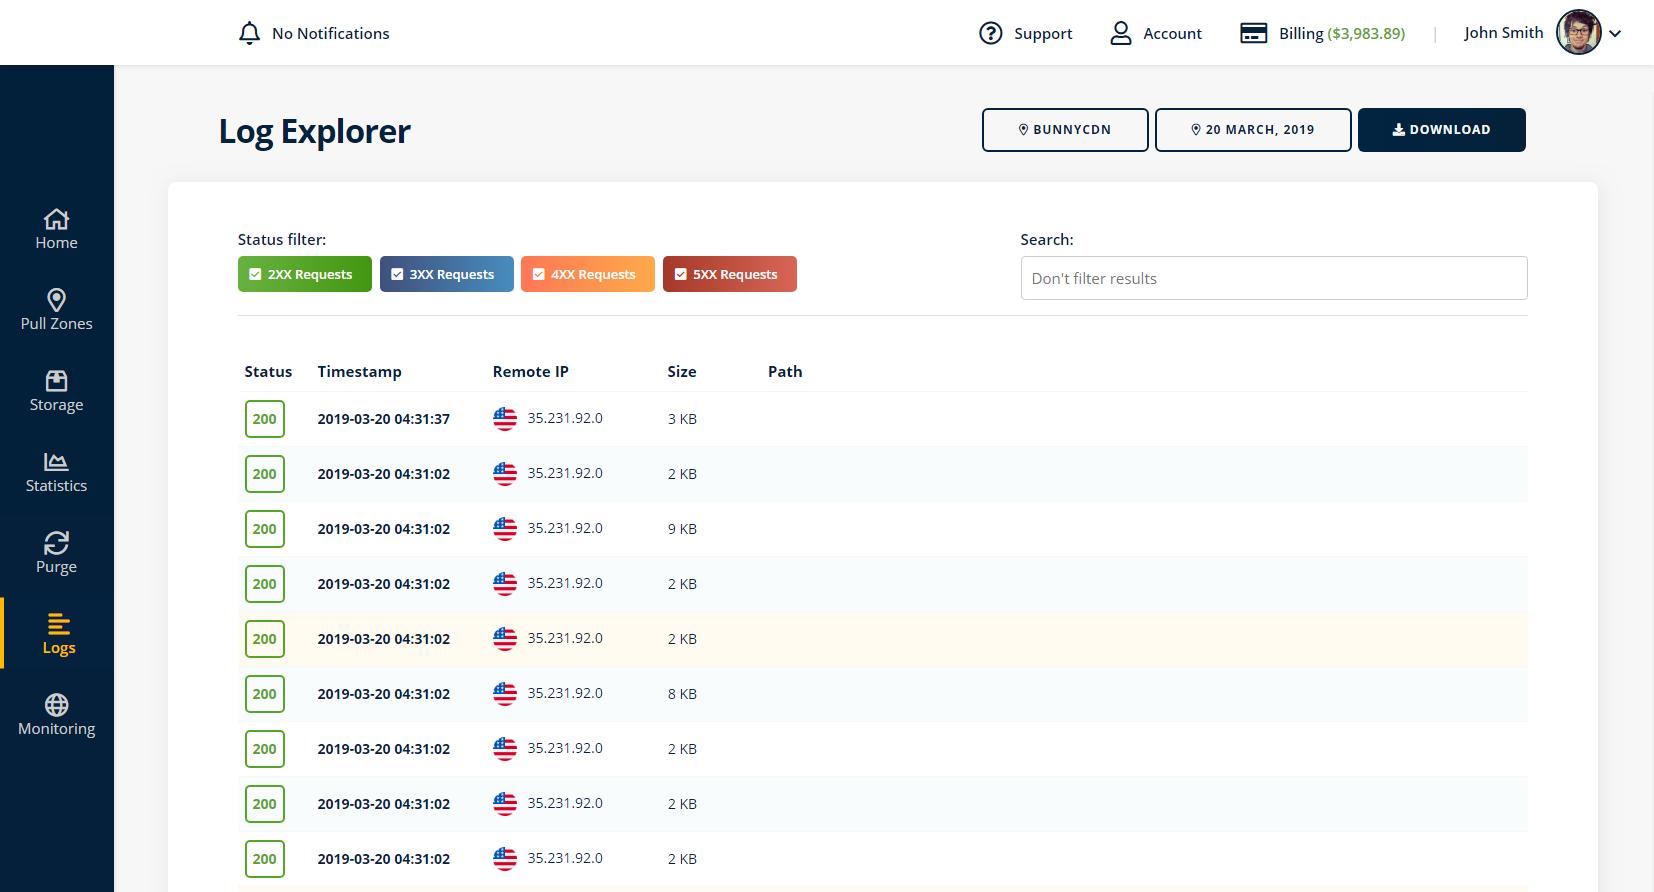 Log Explorer Screenshot